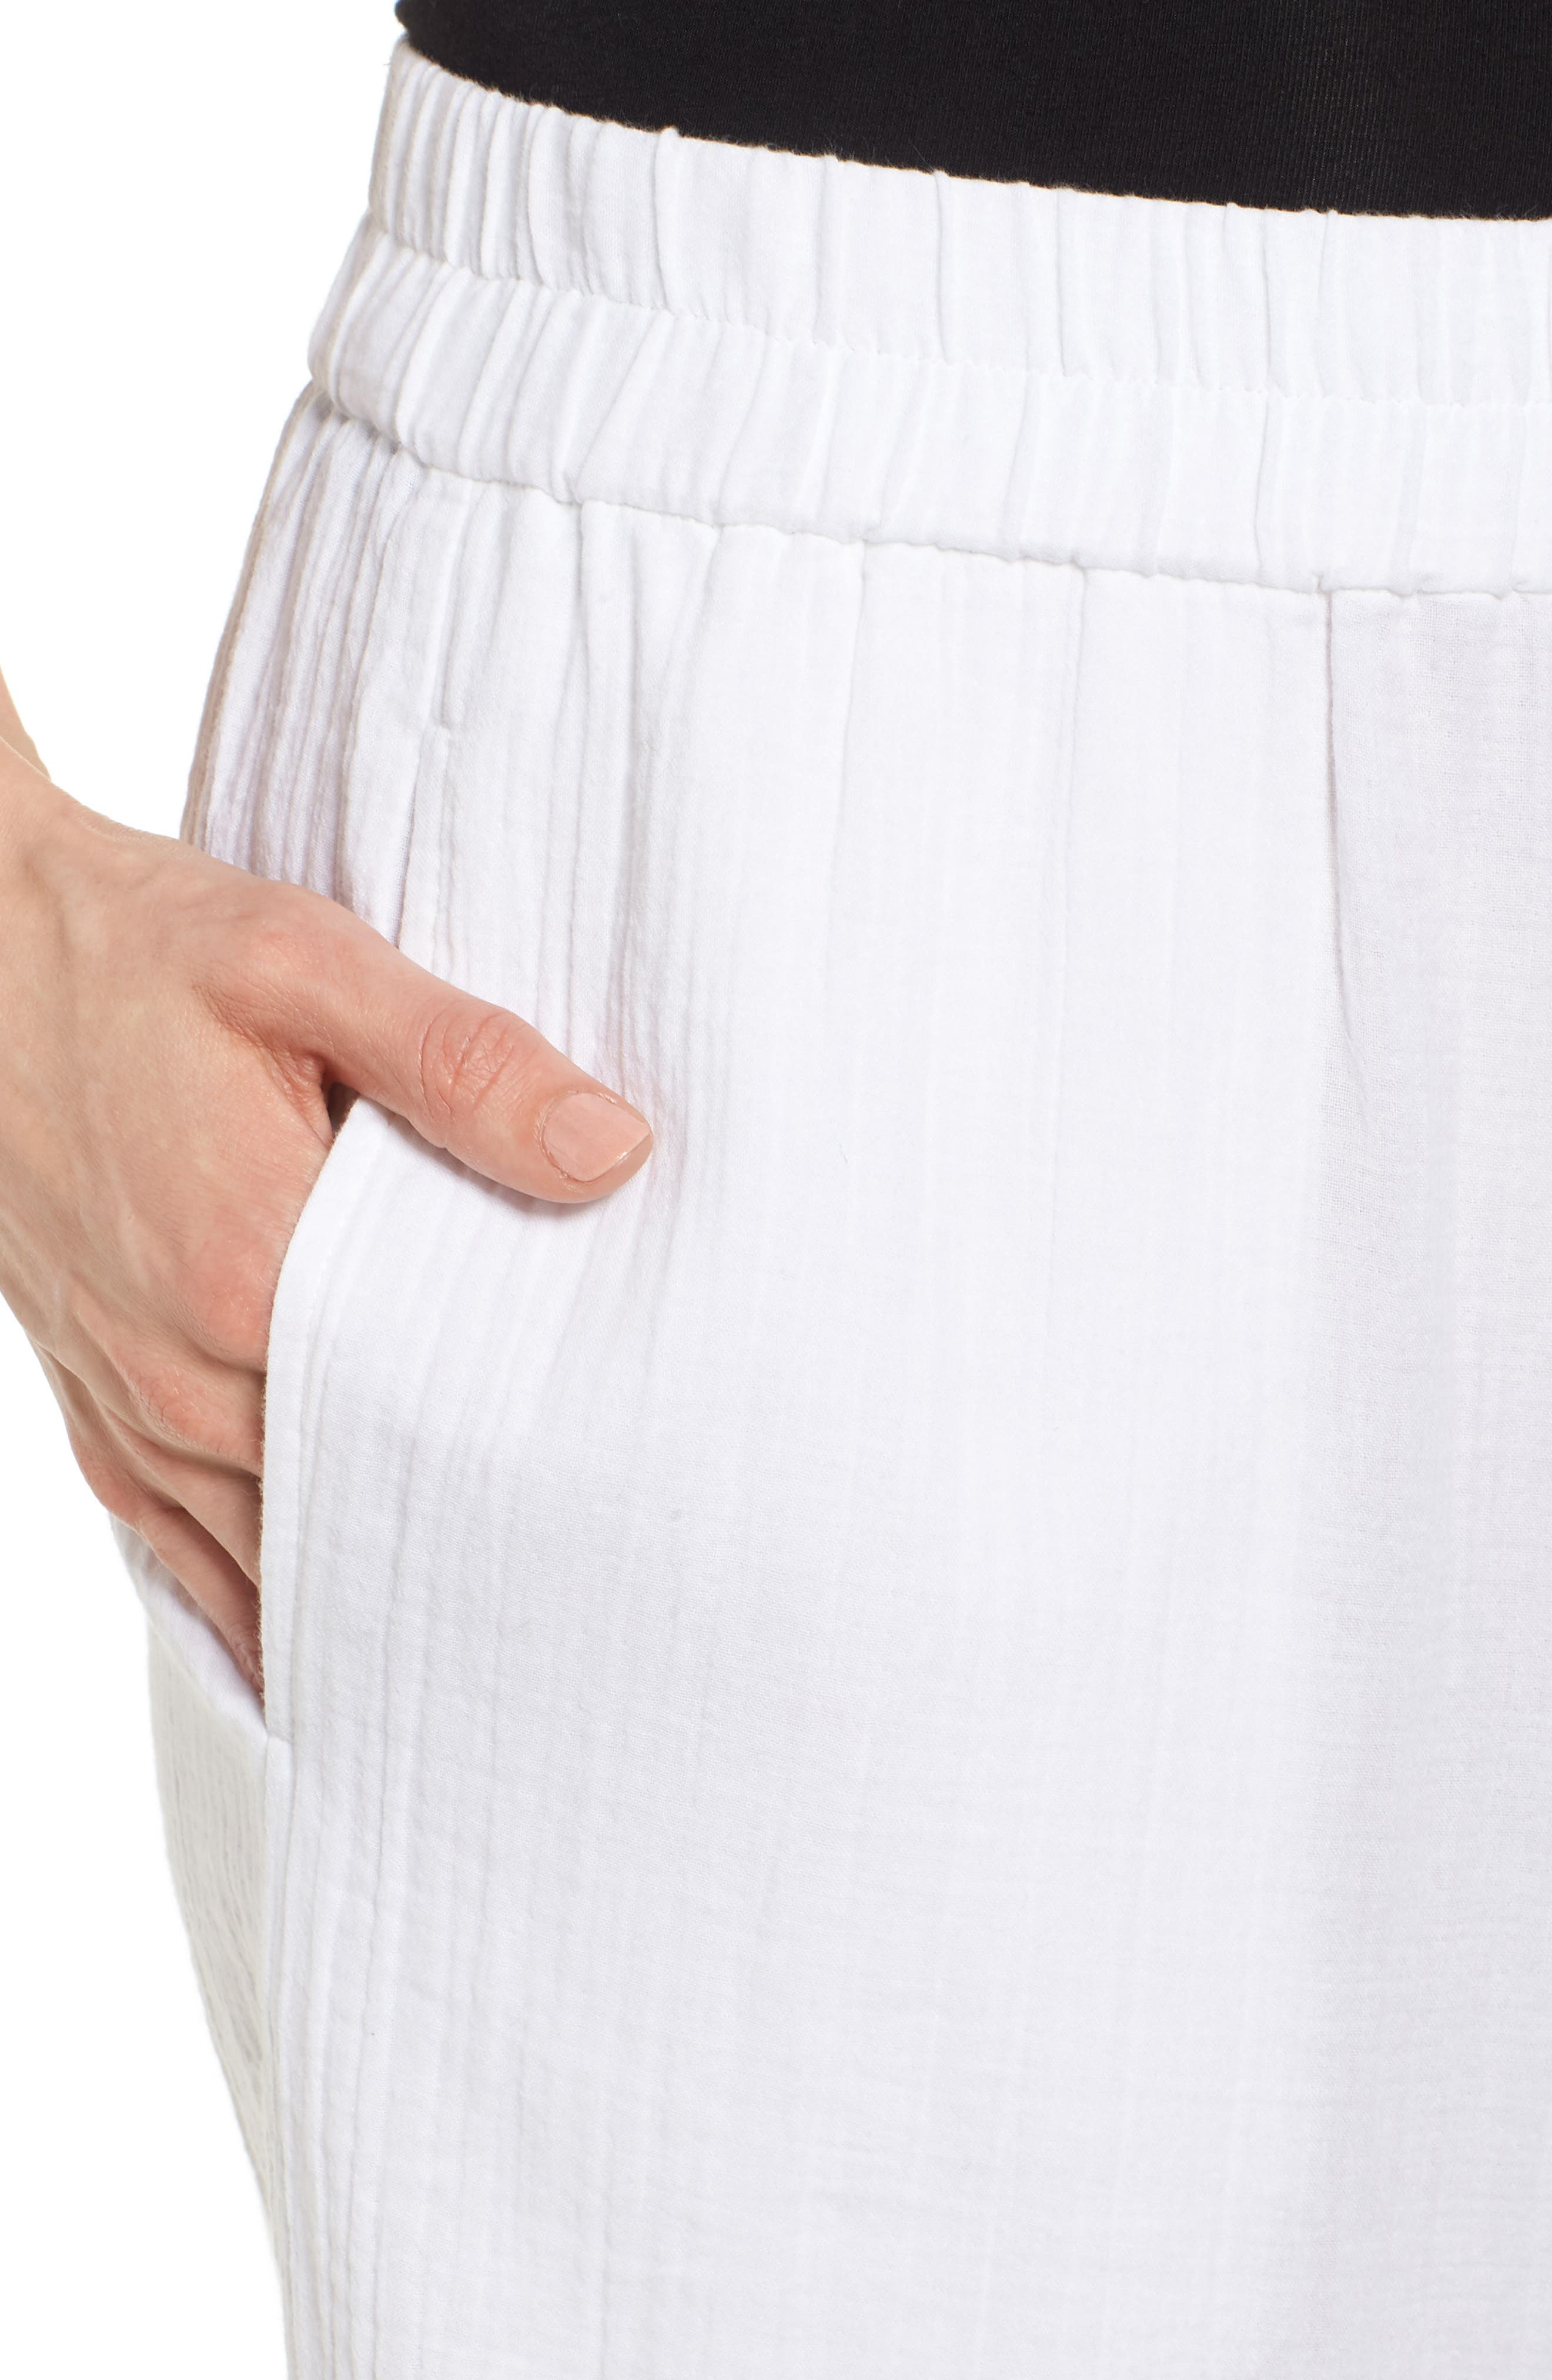 Straight Leg Organic Cotton Pants,                             Alternate thumbnail 4, color,                             White